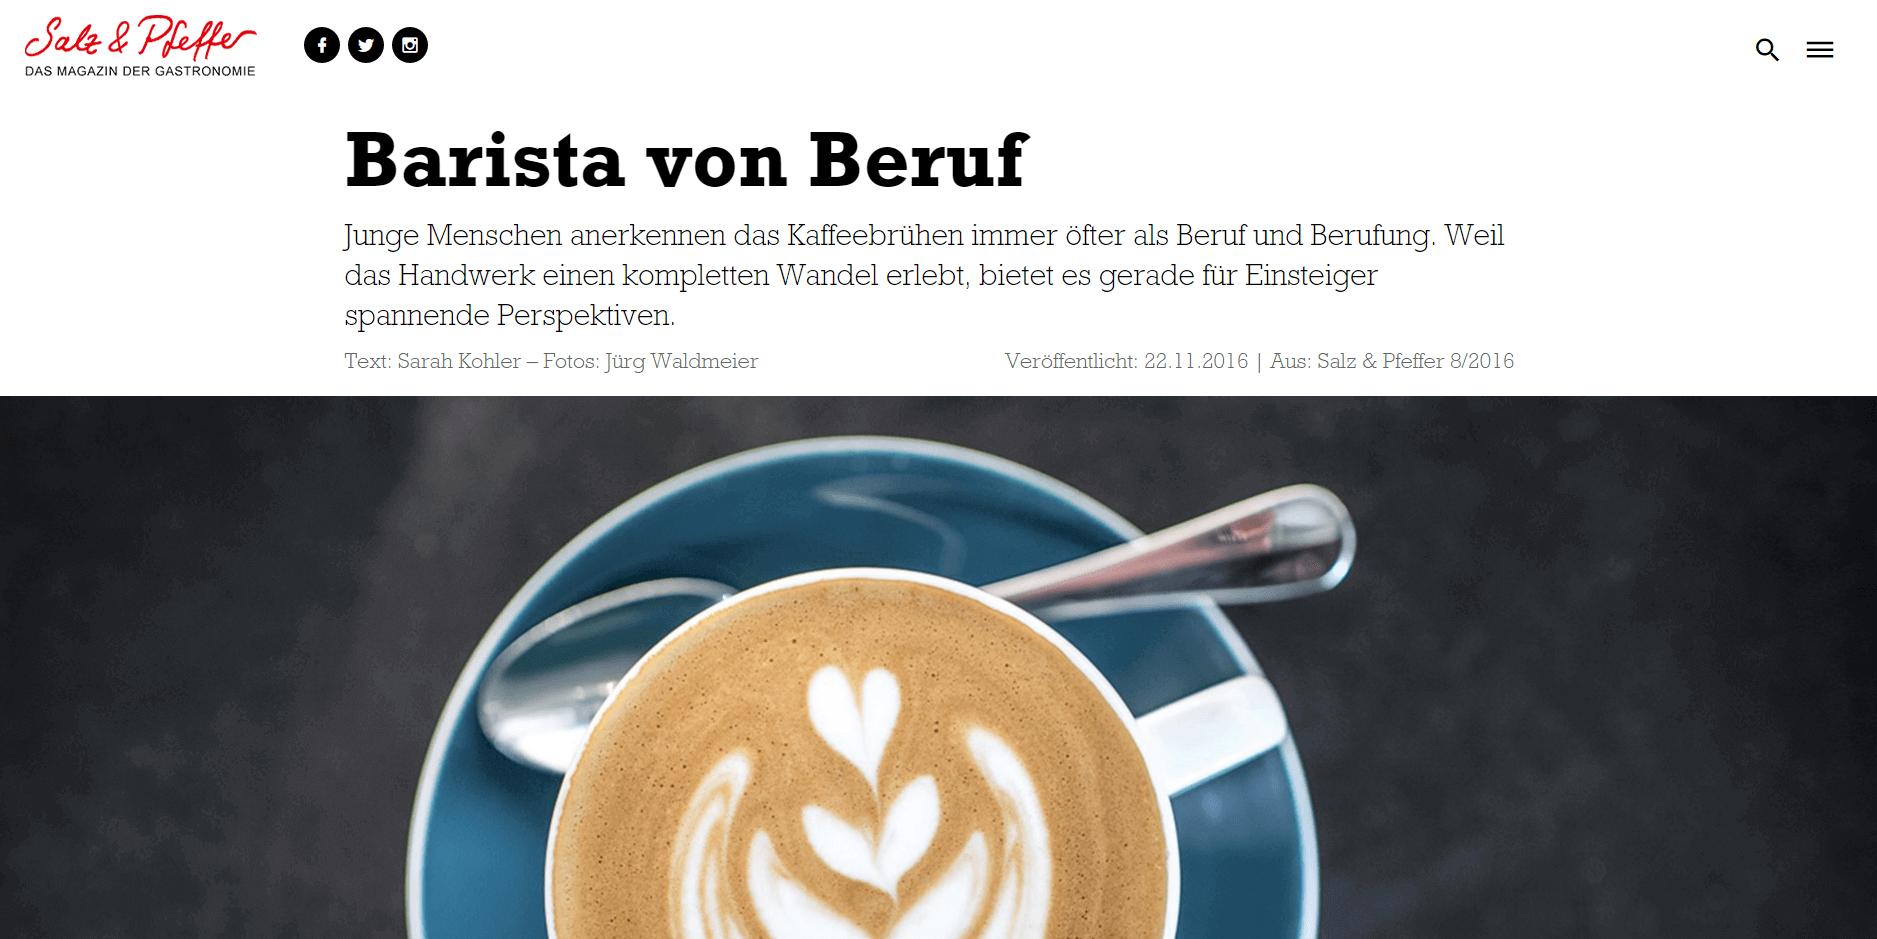 shem leupin Archives - Die Kaffemacher